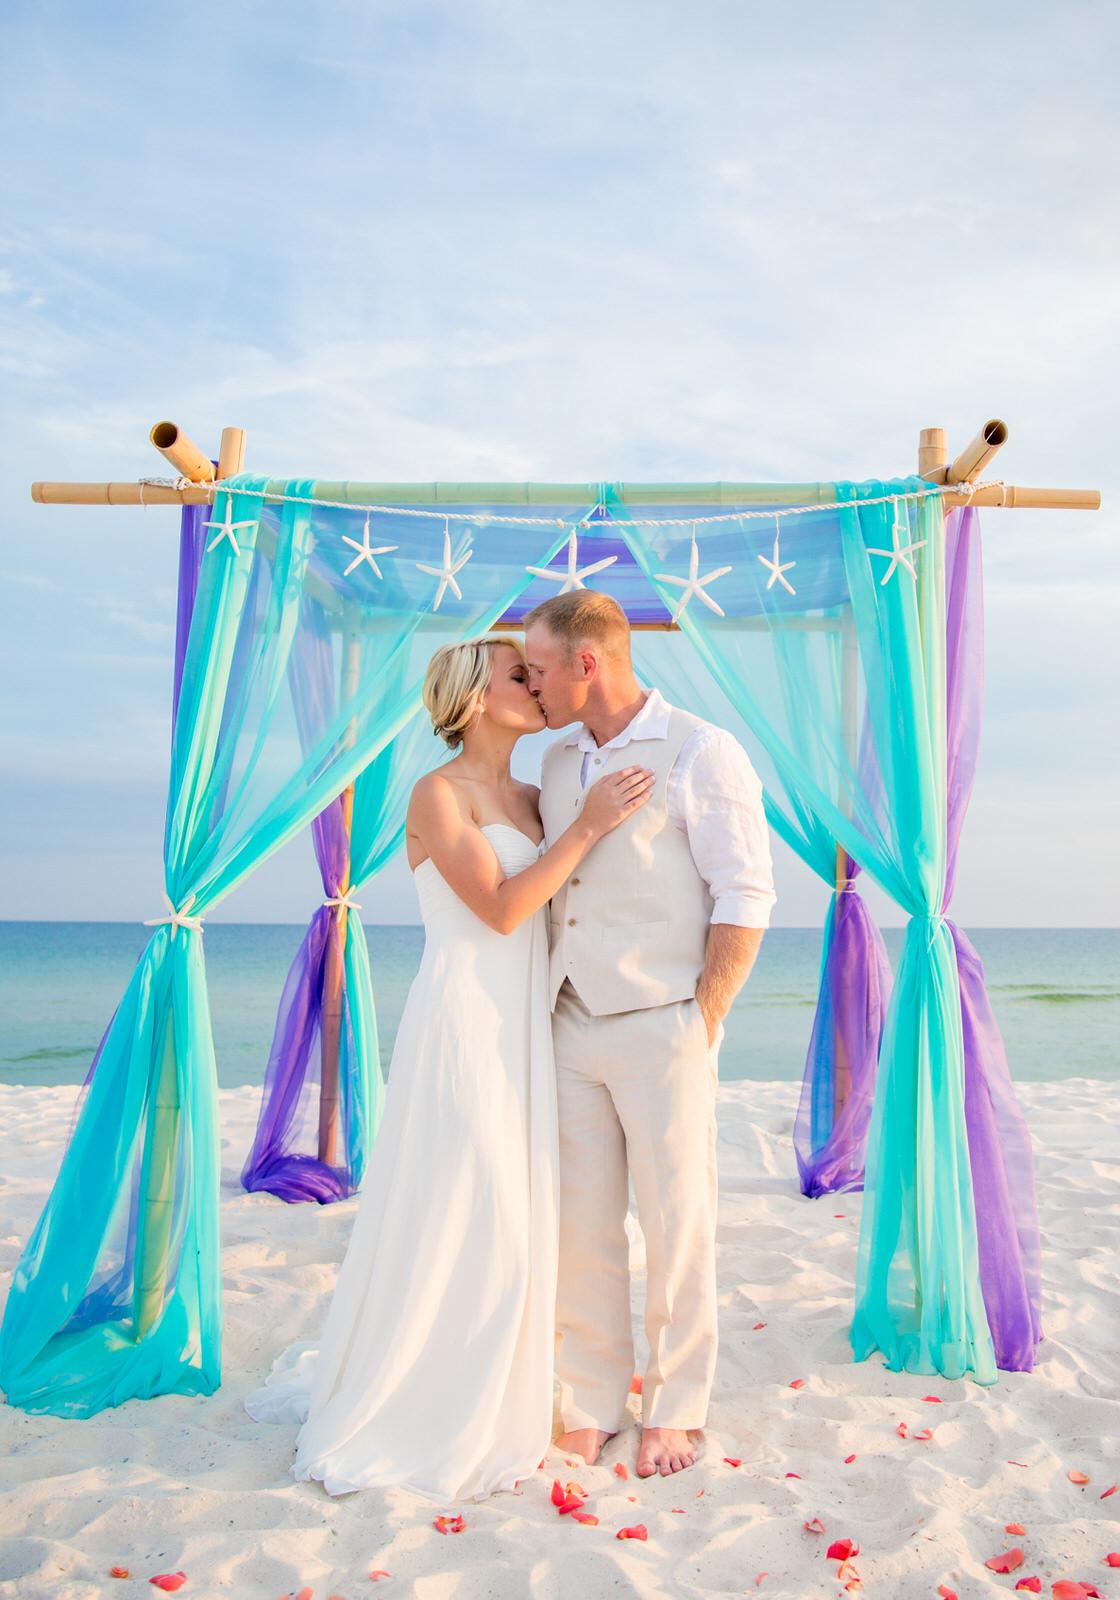 Easy Options for Alabama Beach Wedding Planning